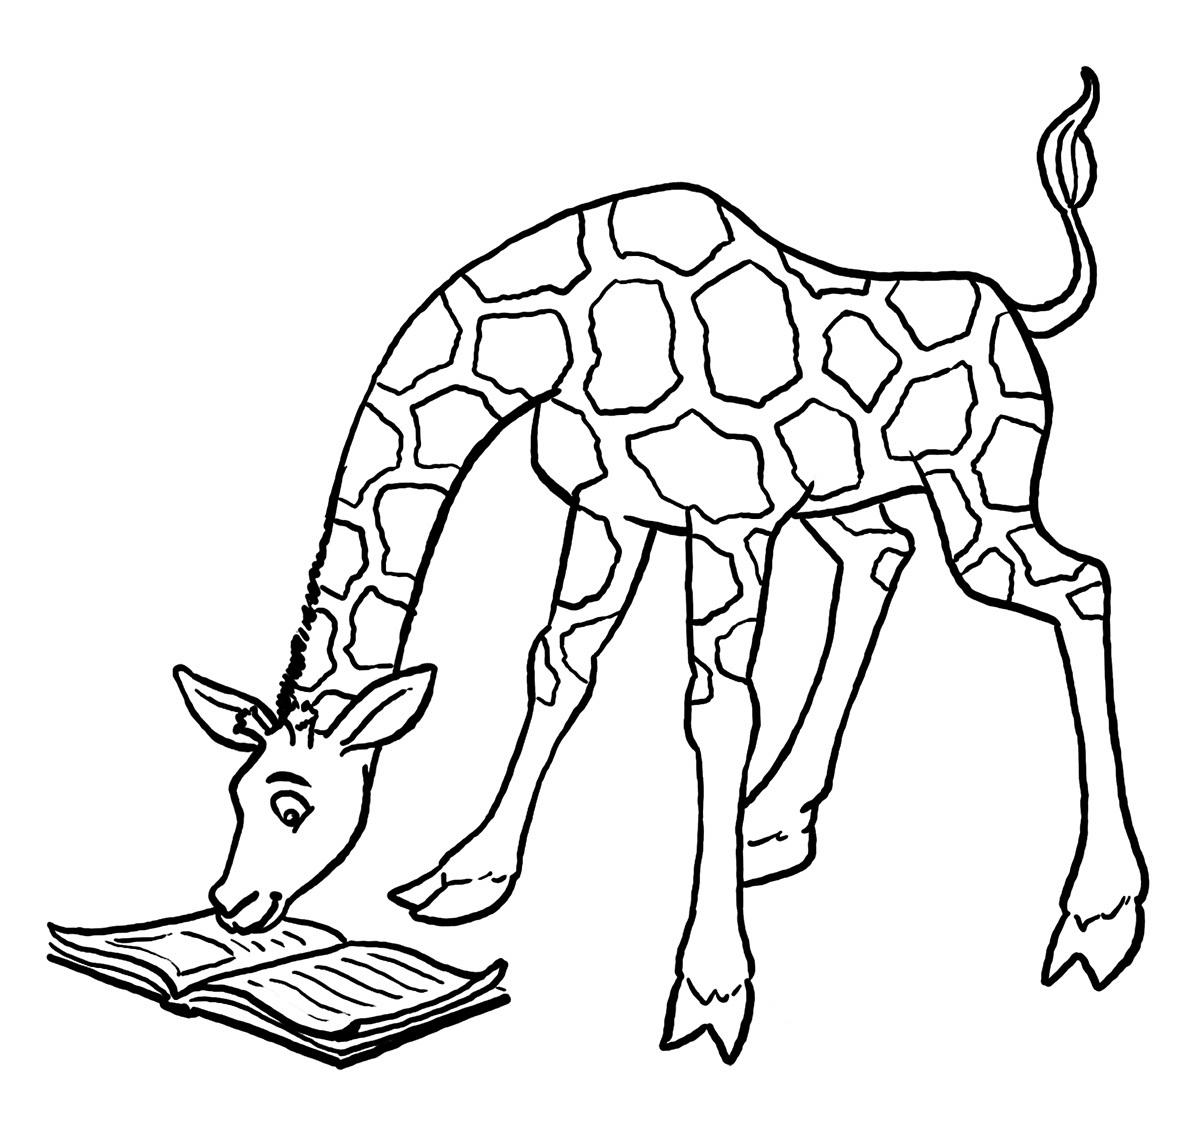 1200x1146 Giraffe Coloring Pages Zebry, Lvi Giraffe